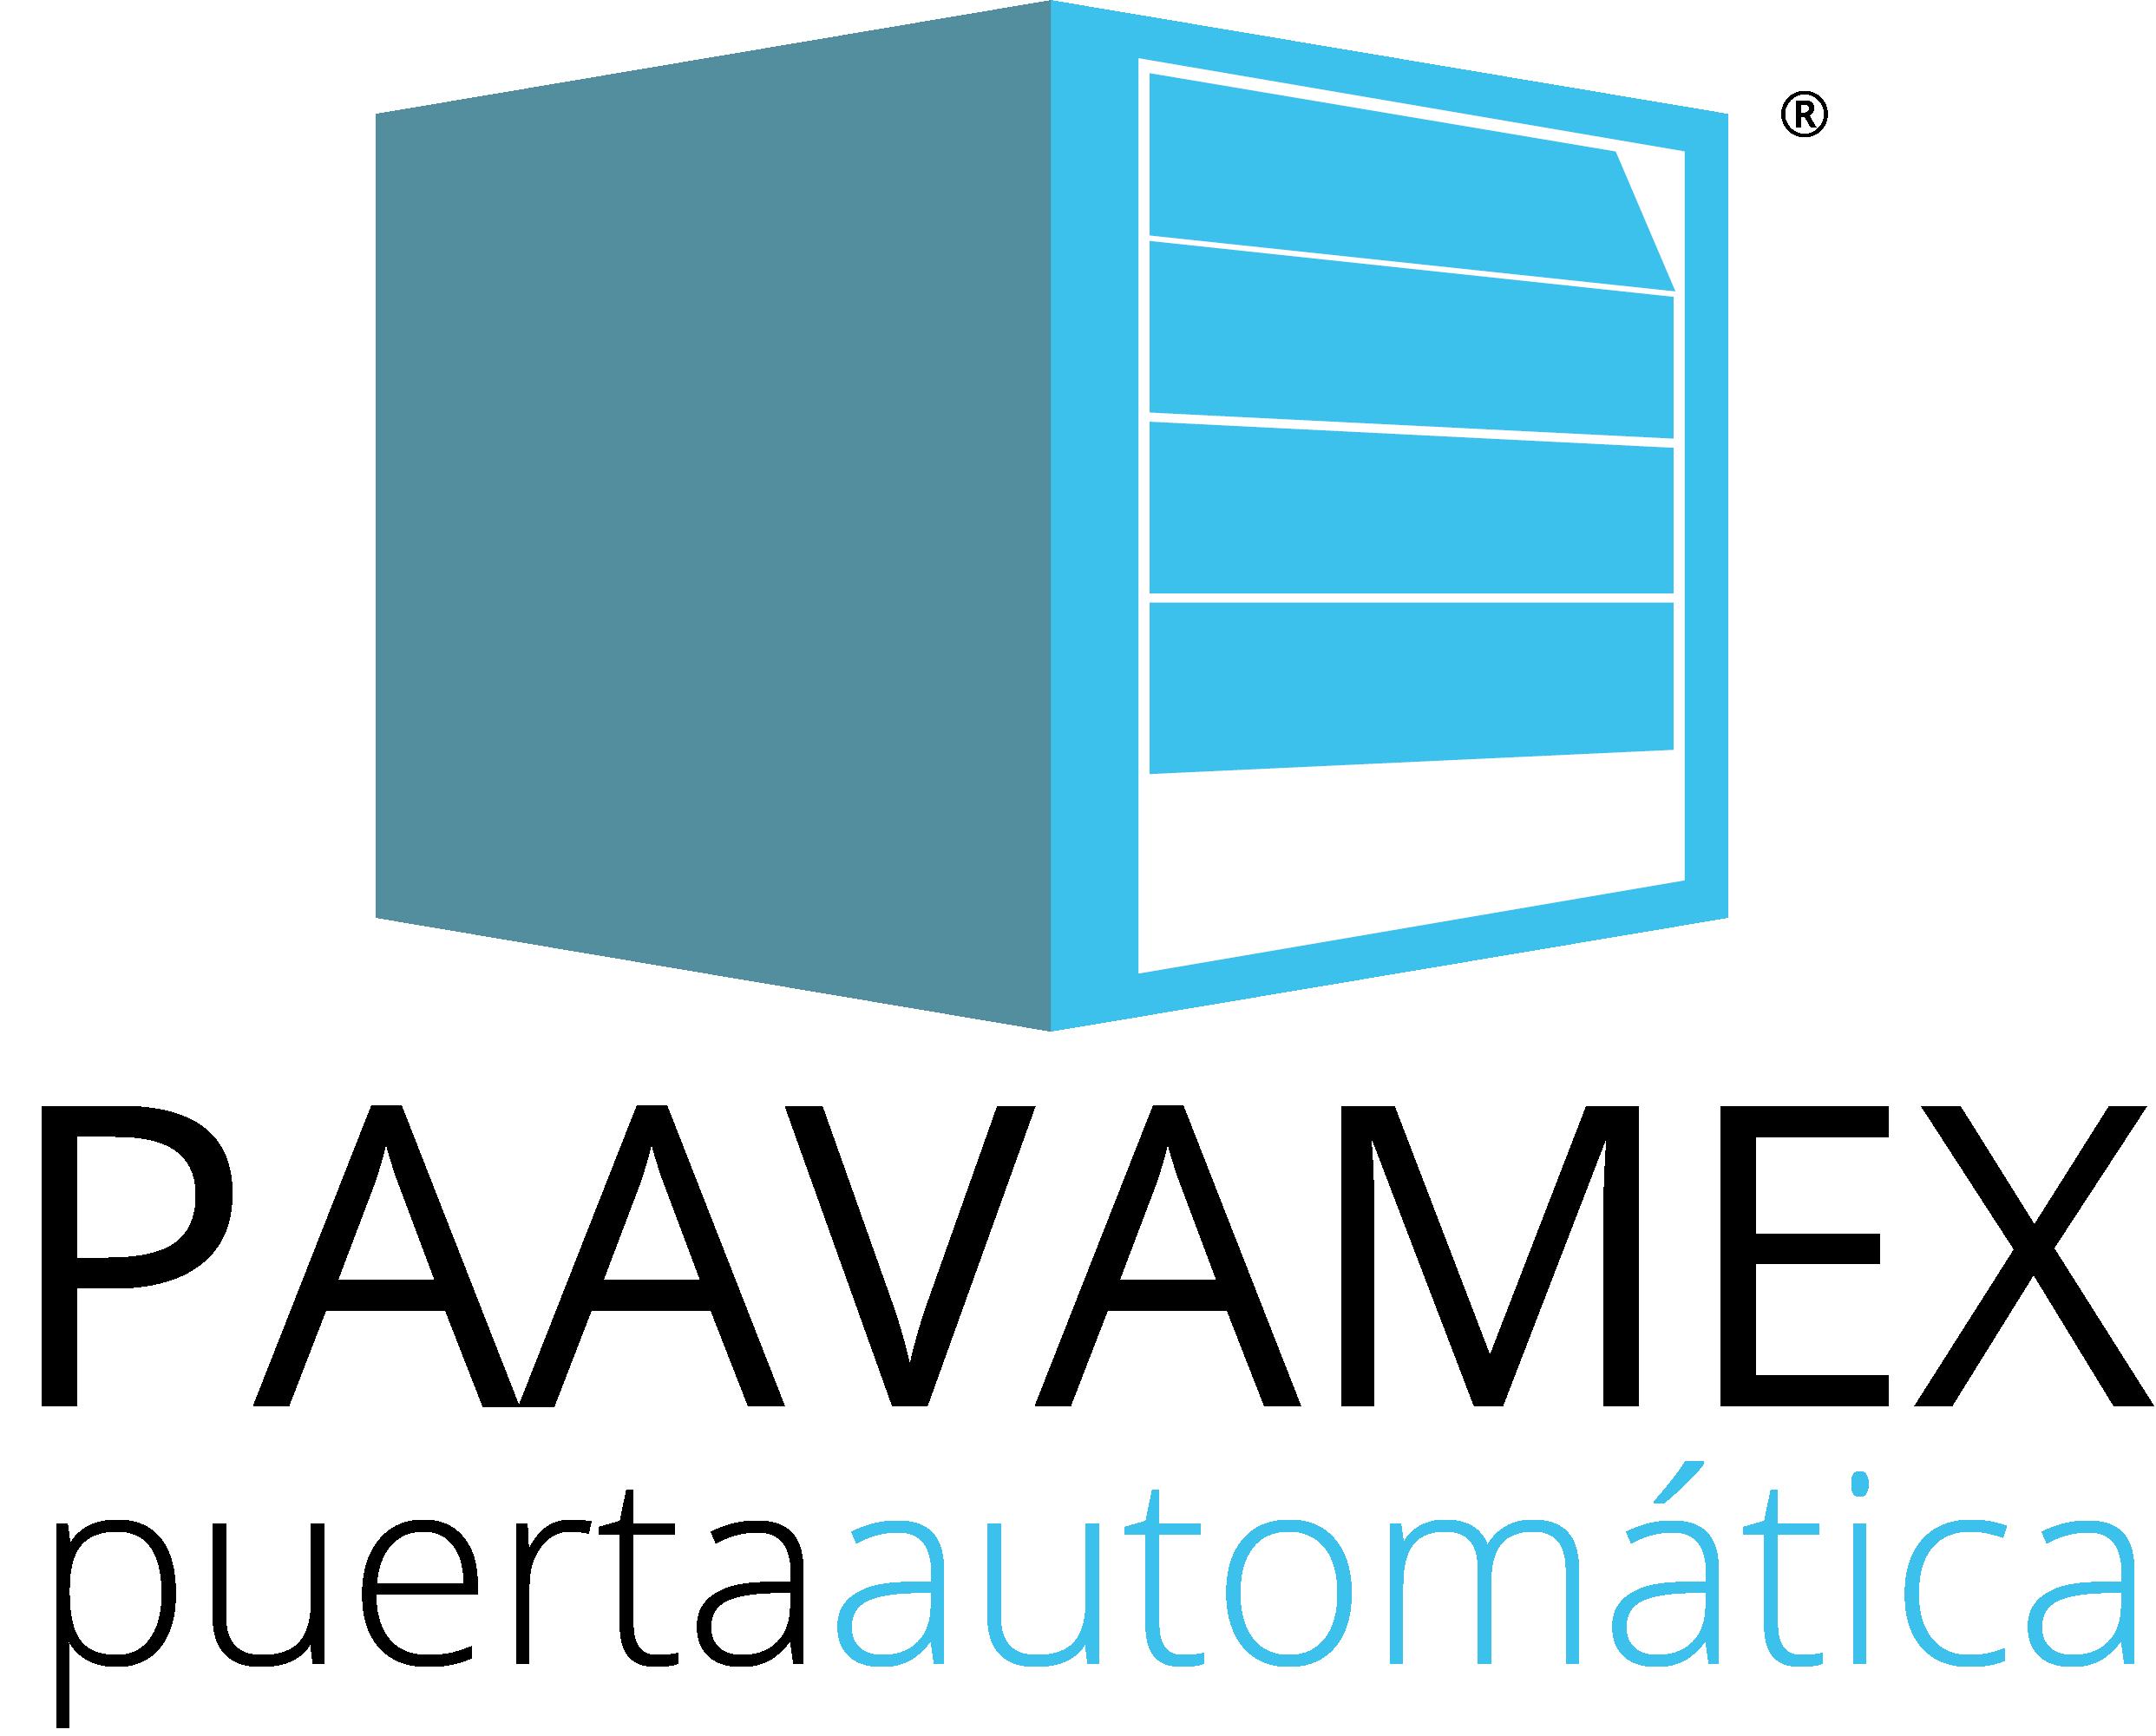 PAAVAMEX logo puerta automatica